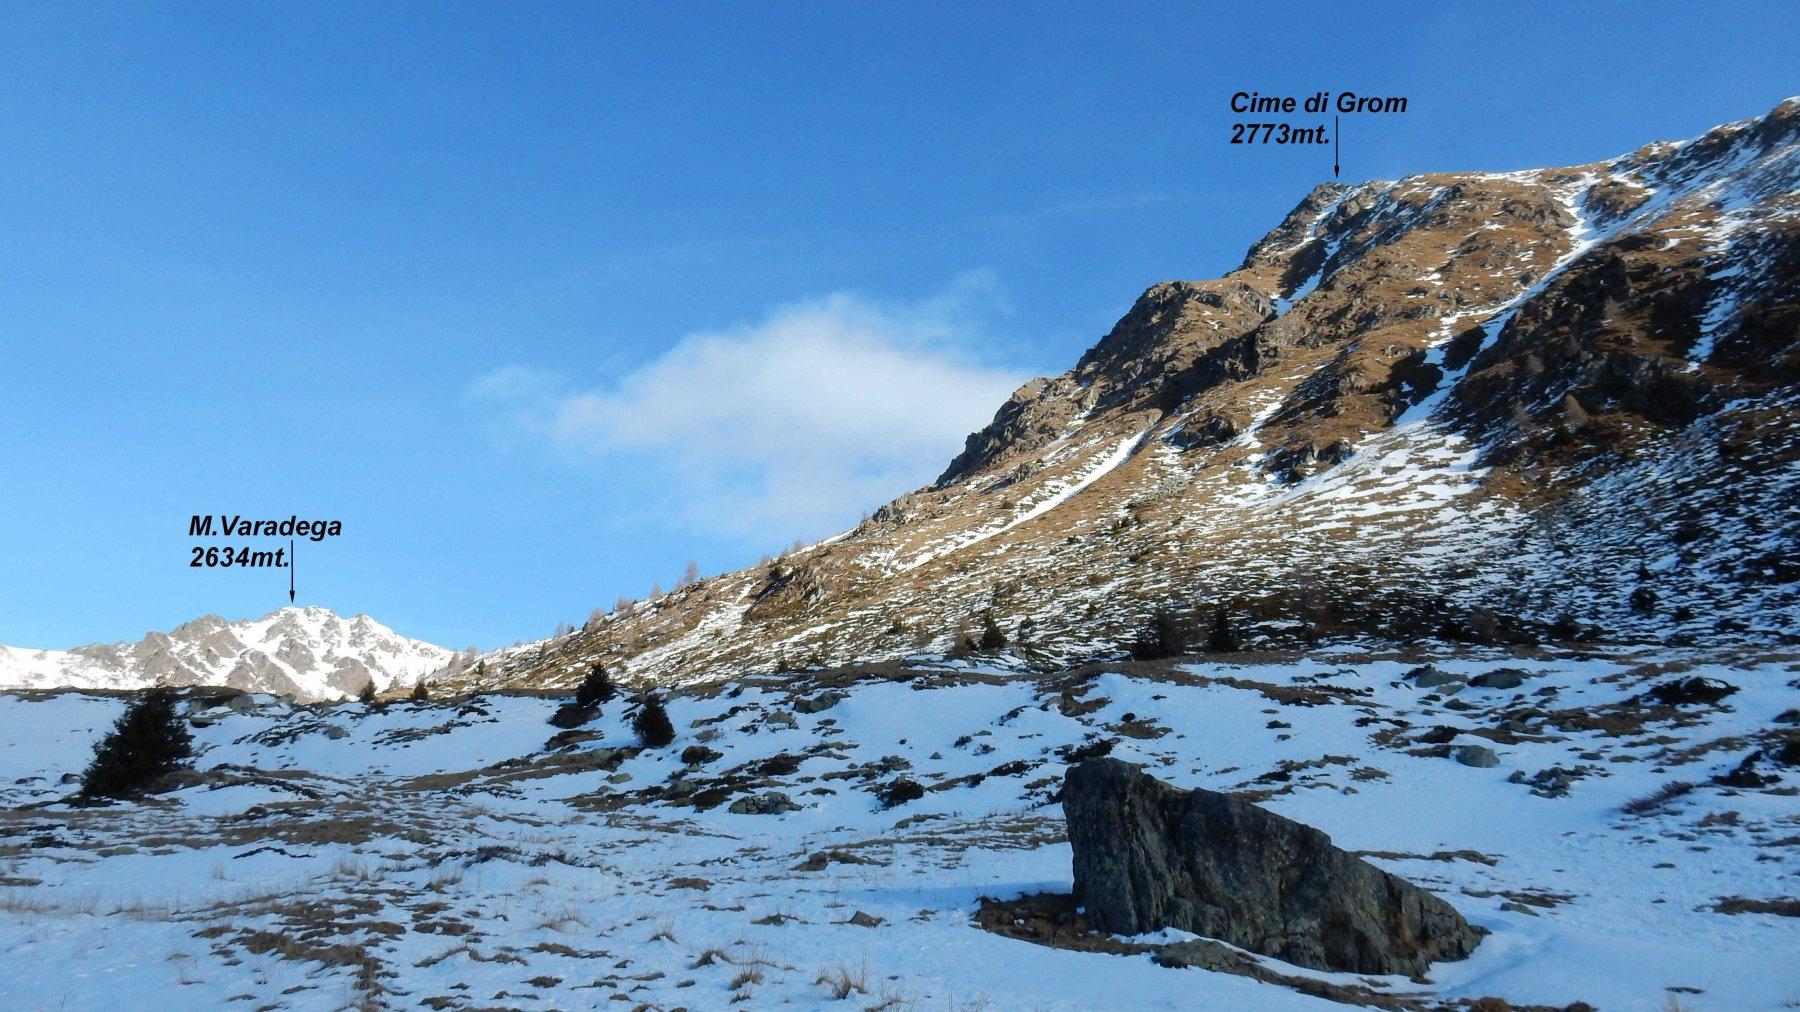 Si entra in Val Varadega. ,anche qui urge neve.